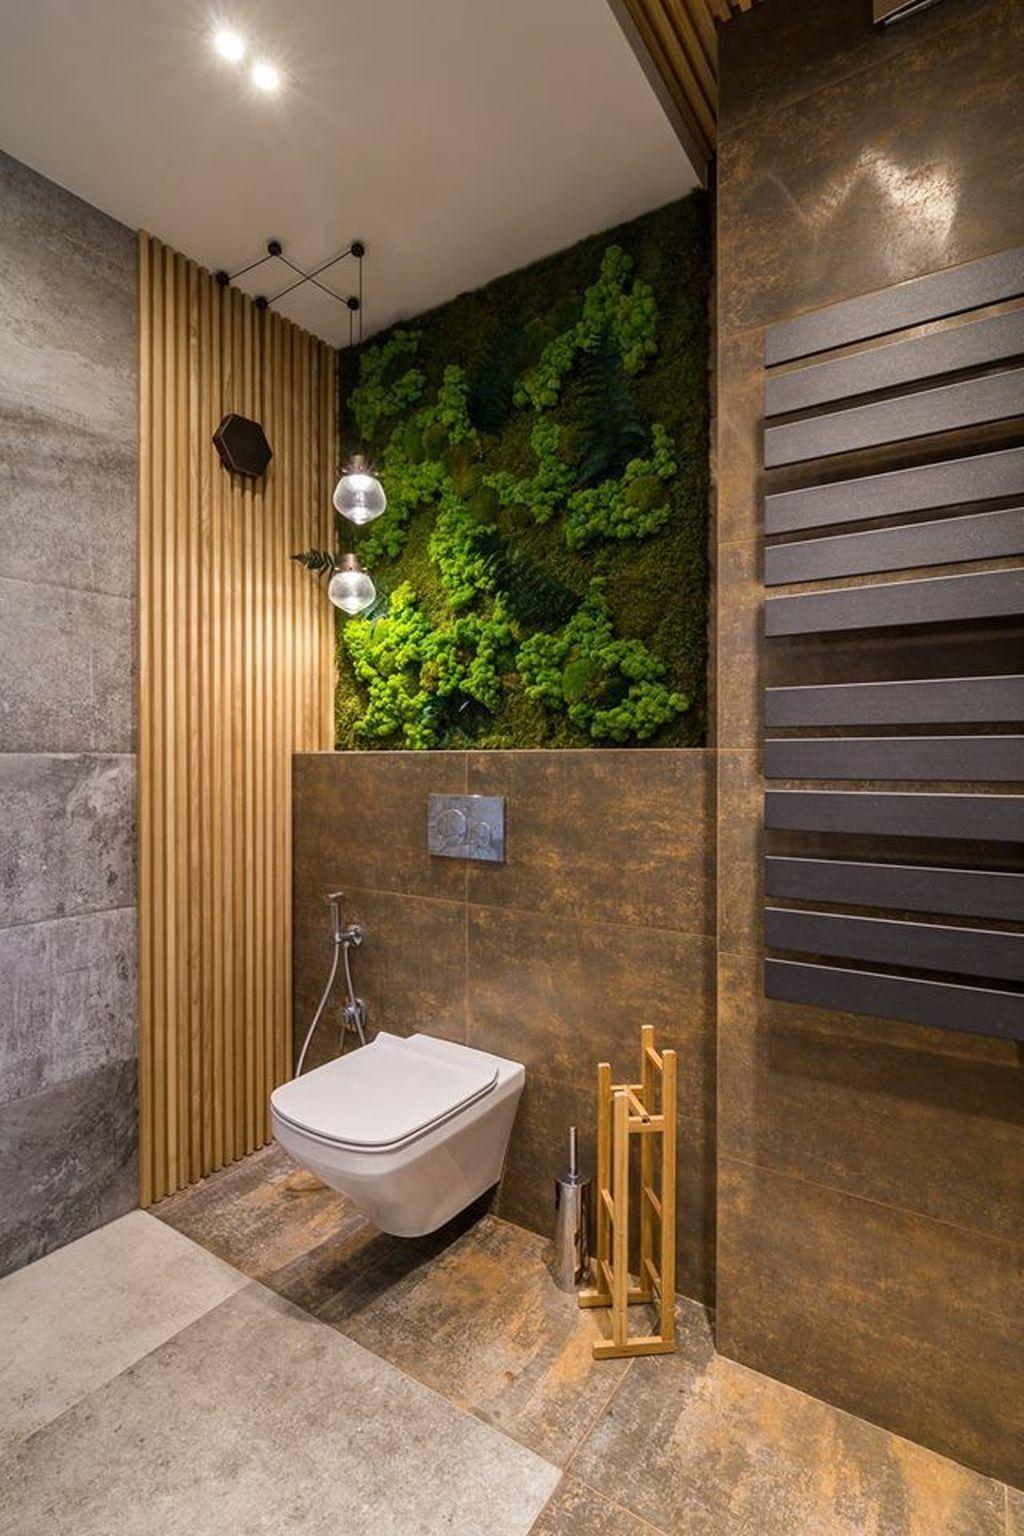 20 Inspiring Bathroom Decoration Ideas With Wooden Storage Minimalist Bathroom Design Bathroom Wall Panels Stylish Bathroom